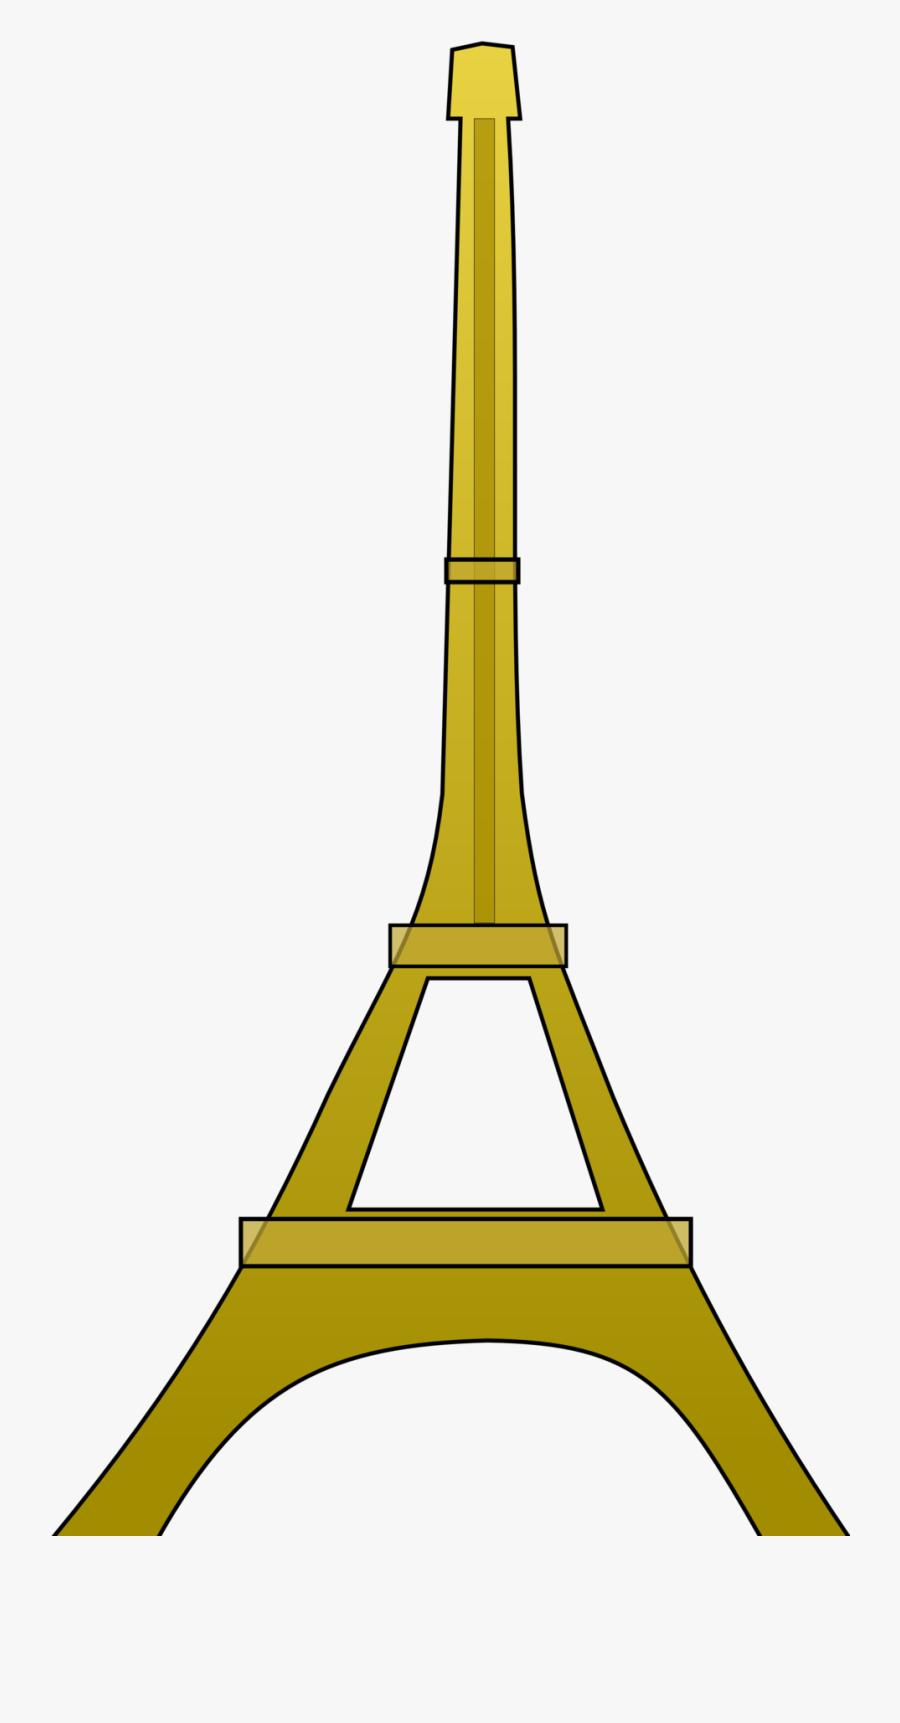 Eiffel Tower - Eiffel Tower Clip Art, Transparent Clipart